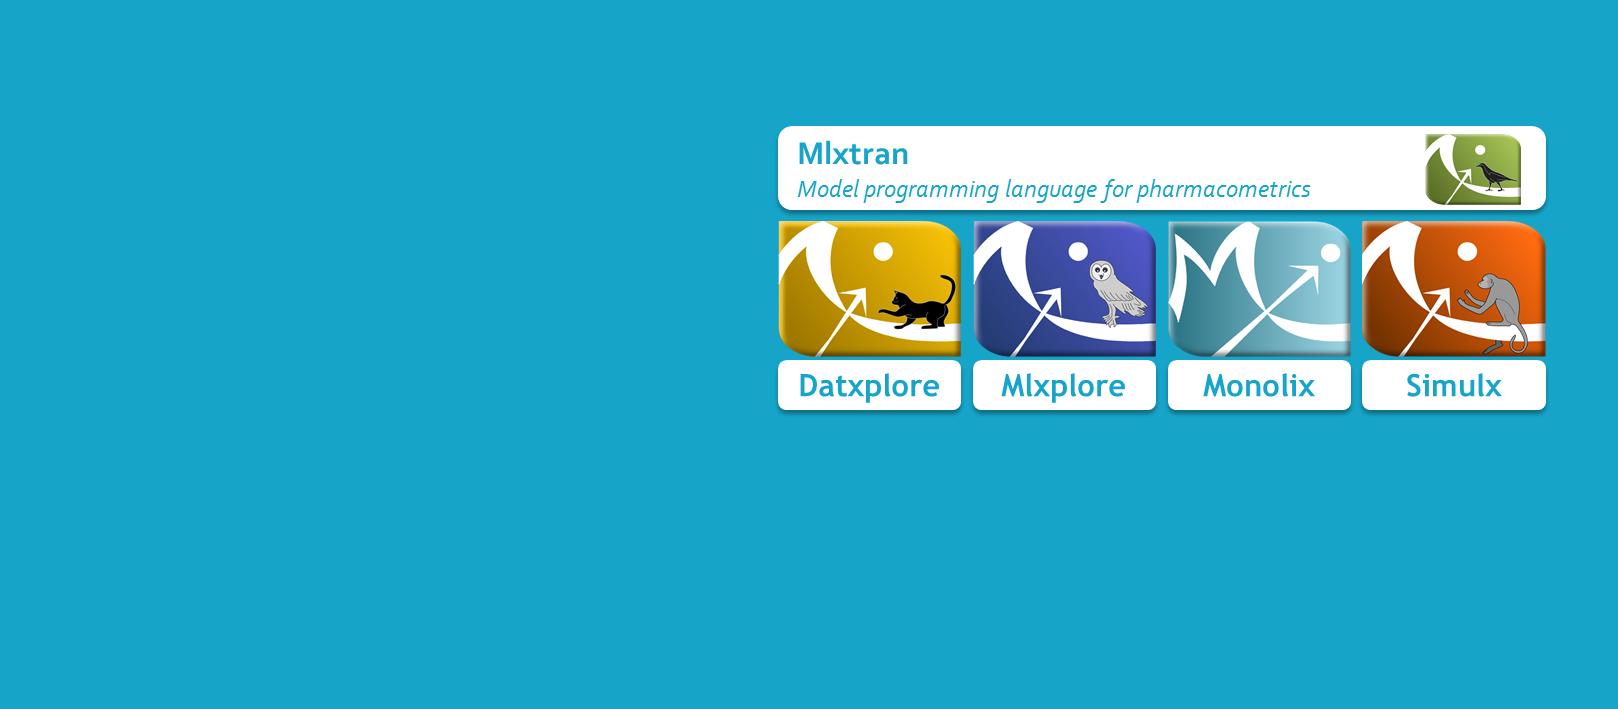 Some 2017 publications using MonolixSuite